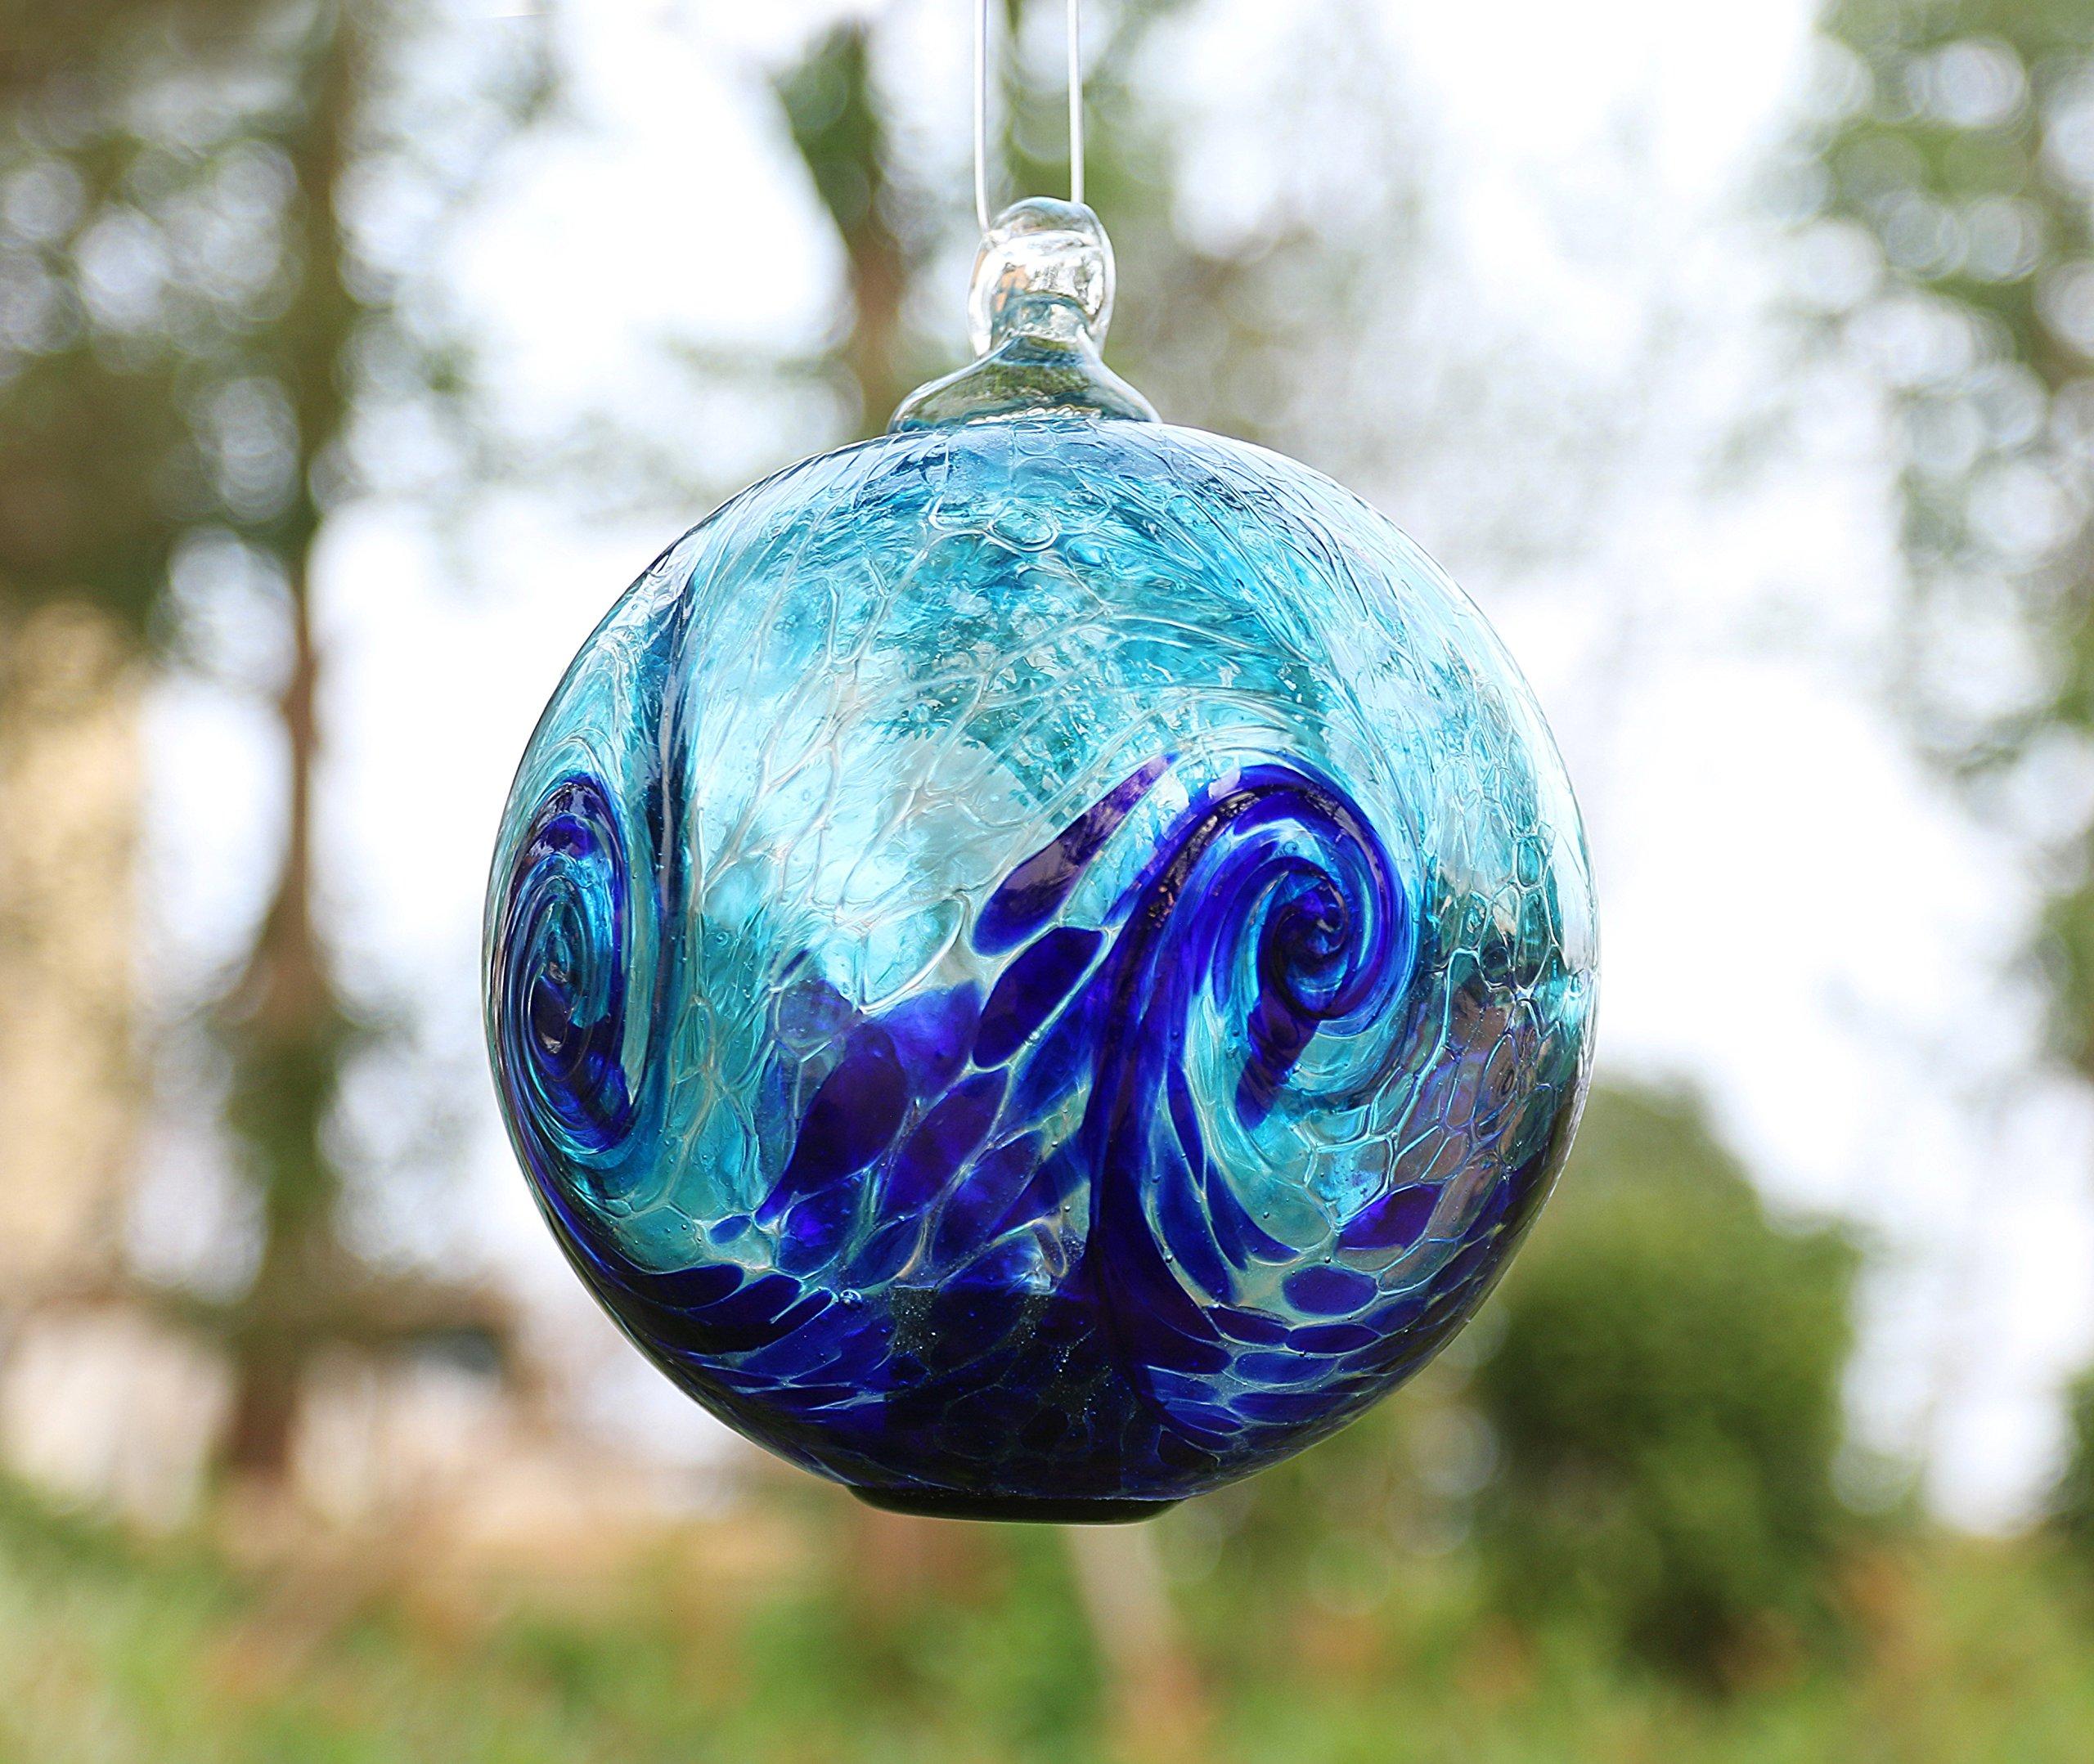 Artisan Crafts and Design 4.6-Inch Solar Hanging Glass Gazing Ball Outdoor Garden Décor Aqua-Blue Swirl